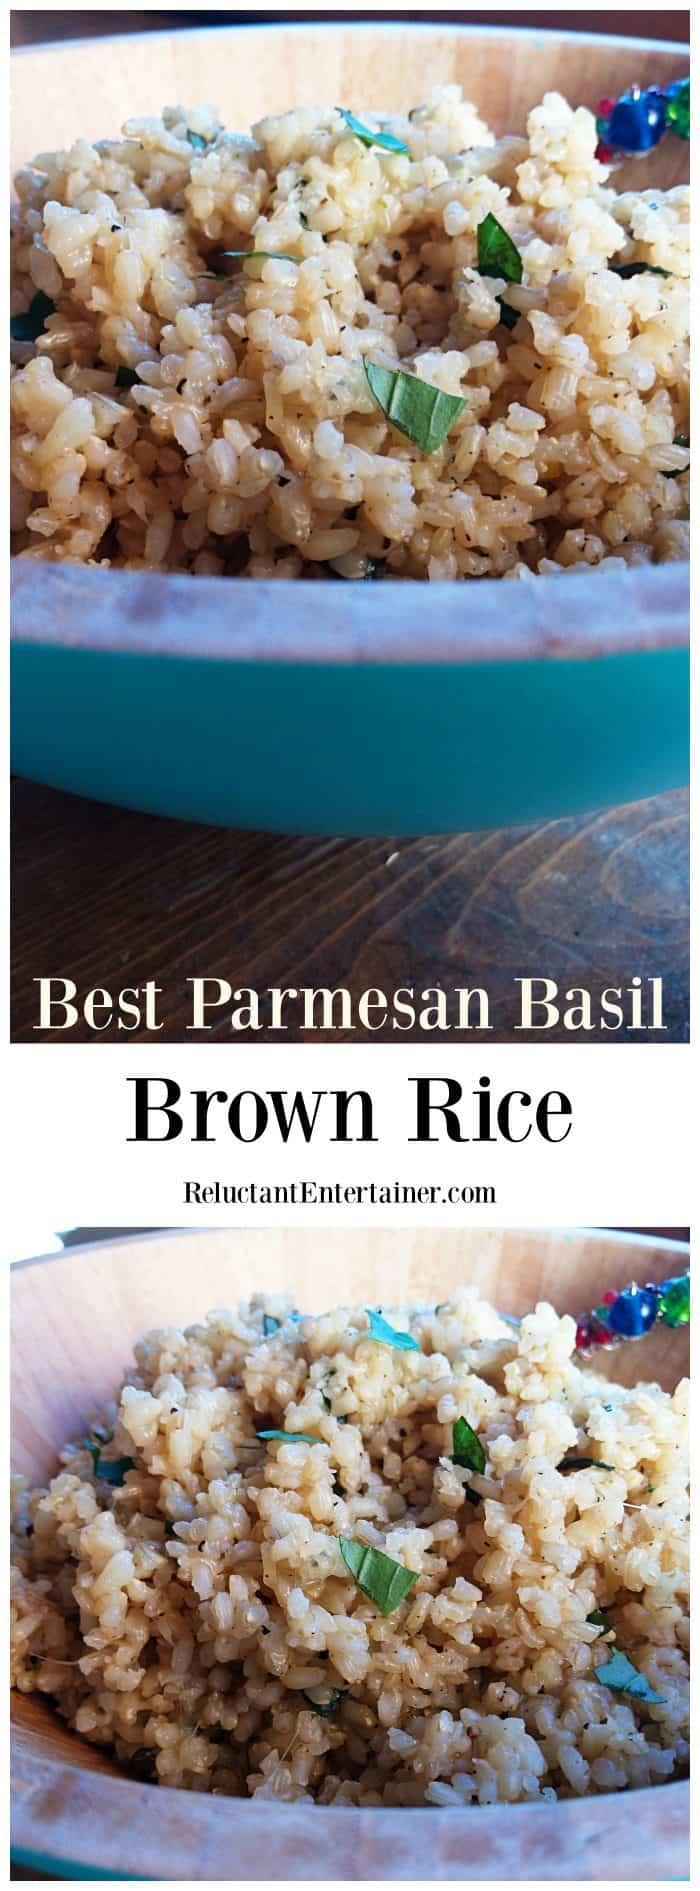 Best Parmesan Basil Brown Rice Recipe